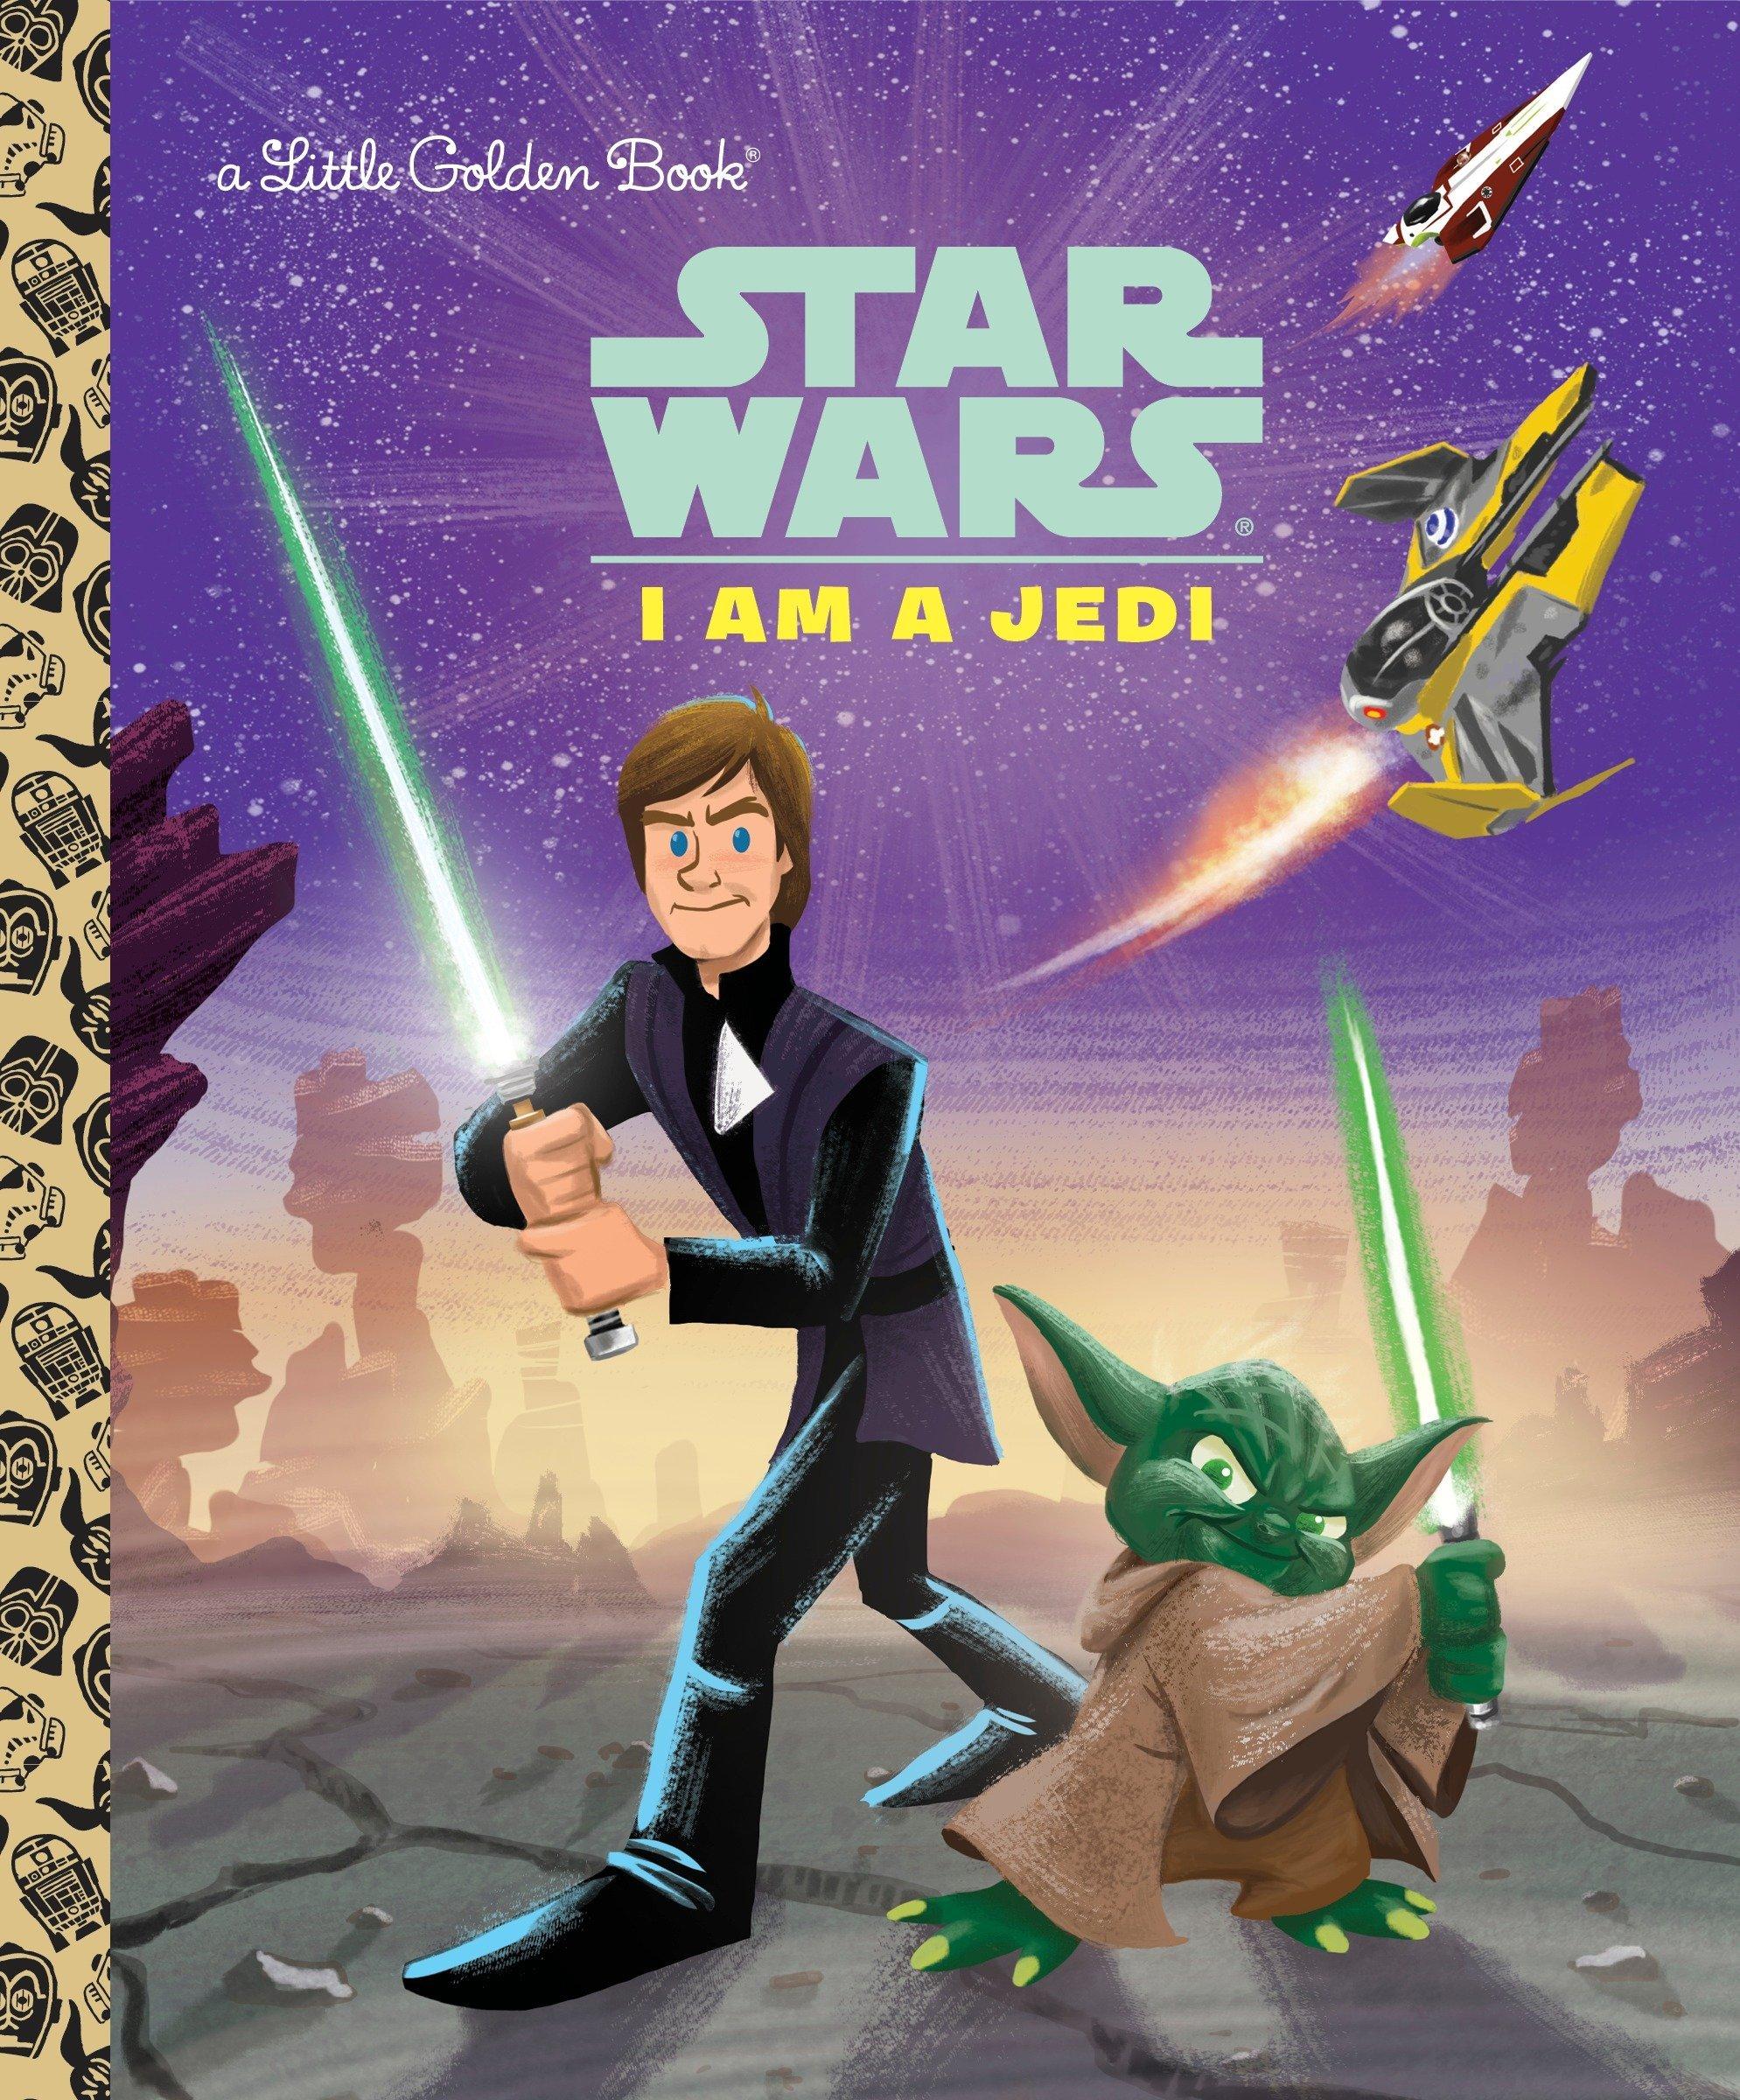 I Am a Jedi (Star Wars) (Little Golden Book): Golden Books, Ron Cohee:  9780736434874: Amazon.com: Books